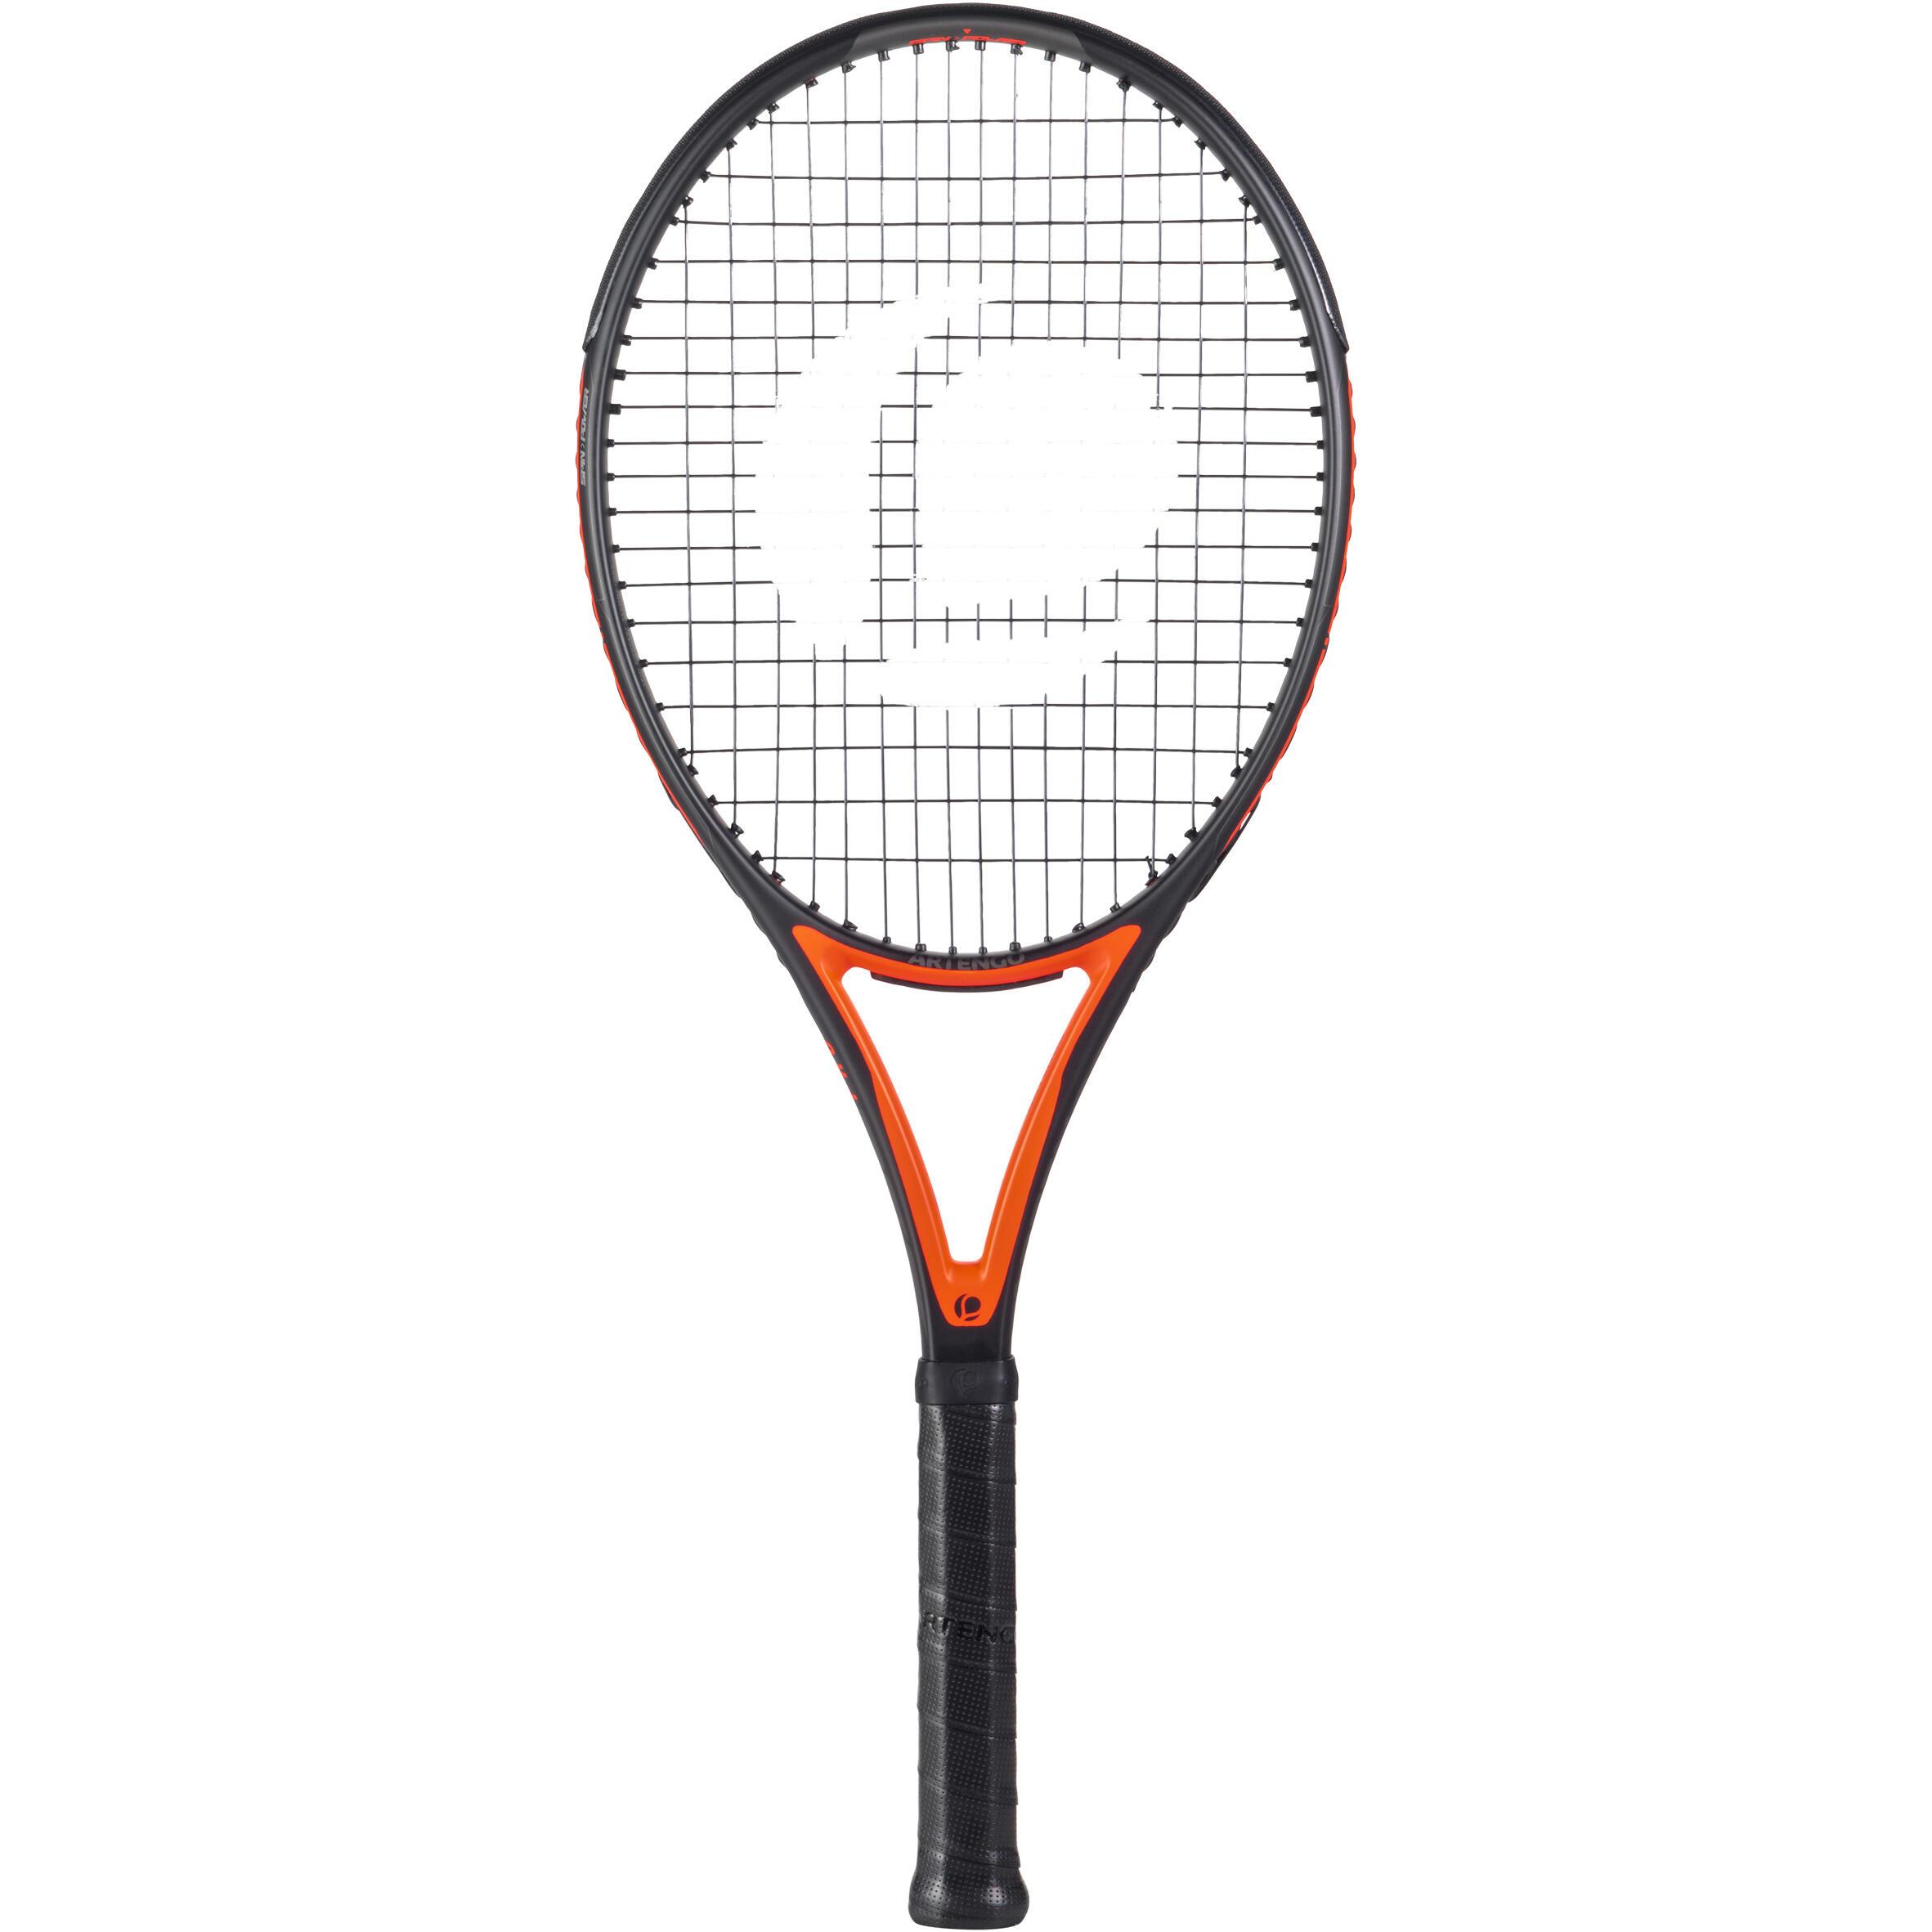 Rachetă Tenis TR990 PRO